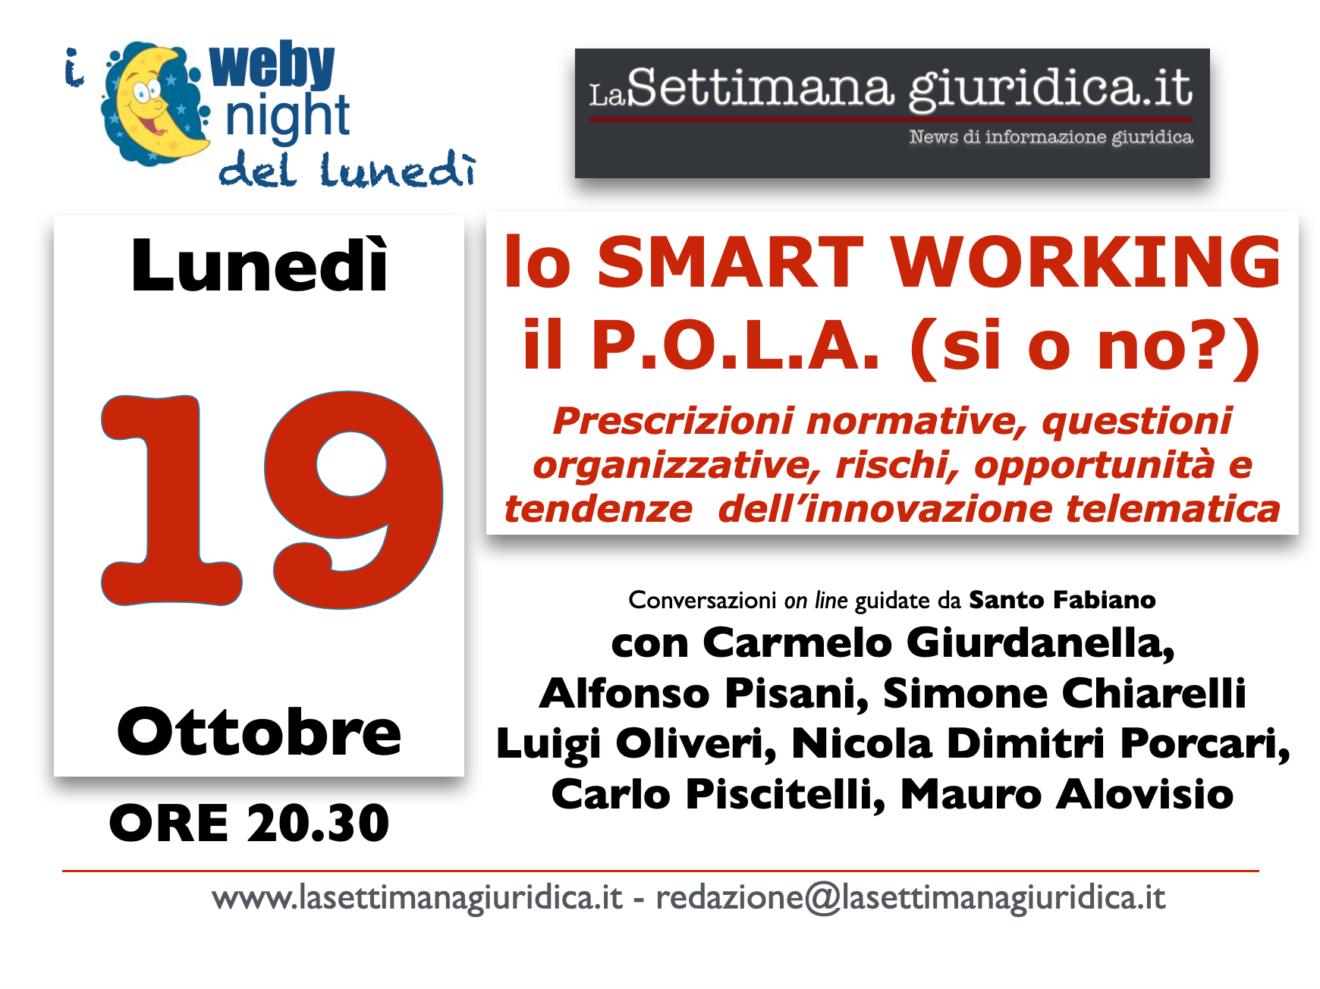 webynight-19-ottobre-smart-working